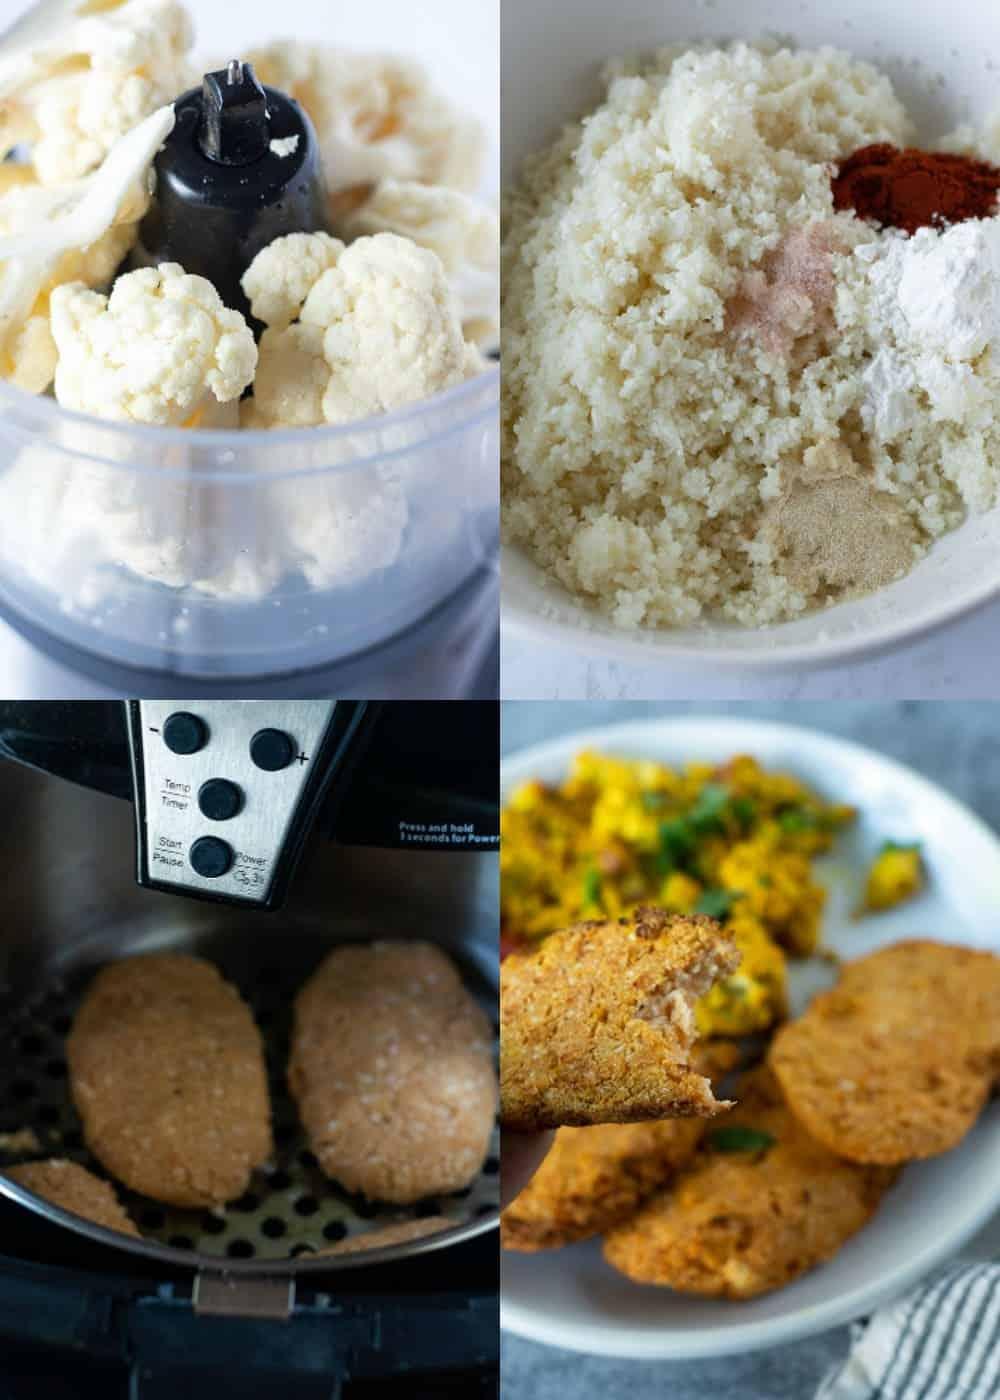 Ingredients for cauliflower hash brown